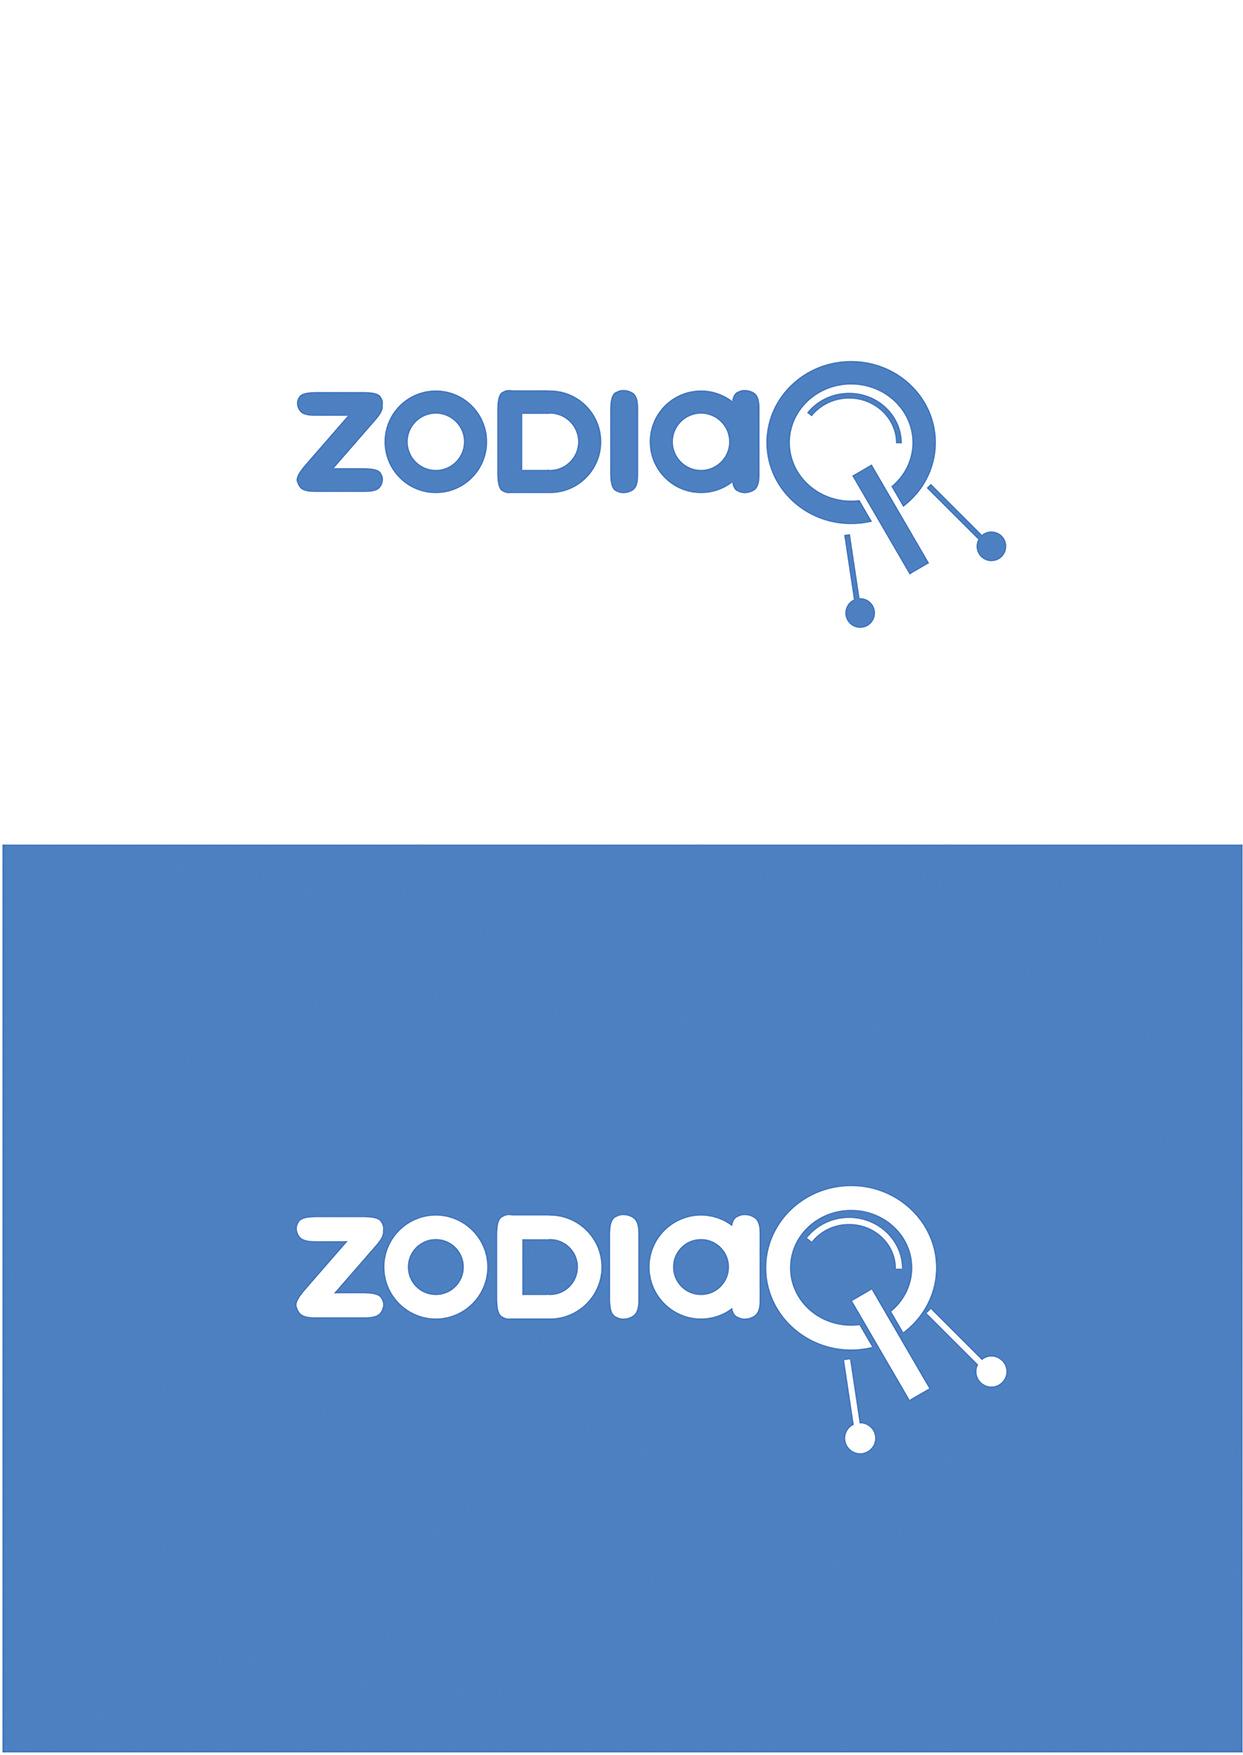 Разработка логотипа и основных элементов стиля фото f_478598da77e359e9.jpg